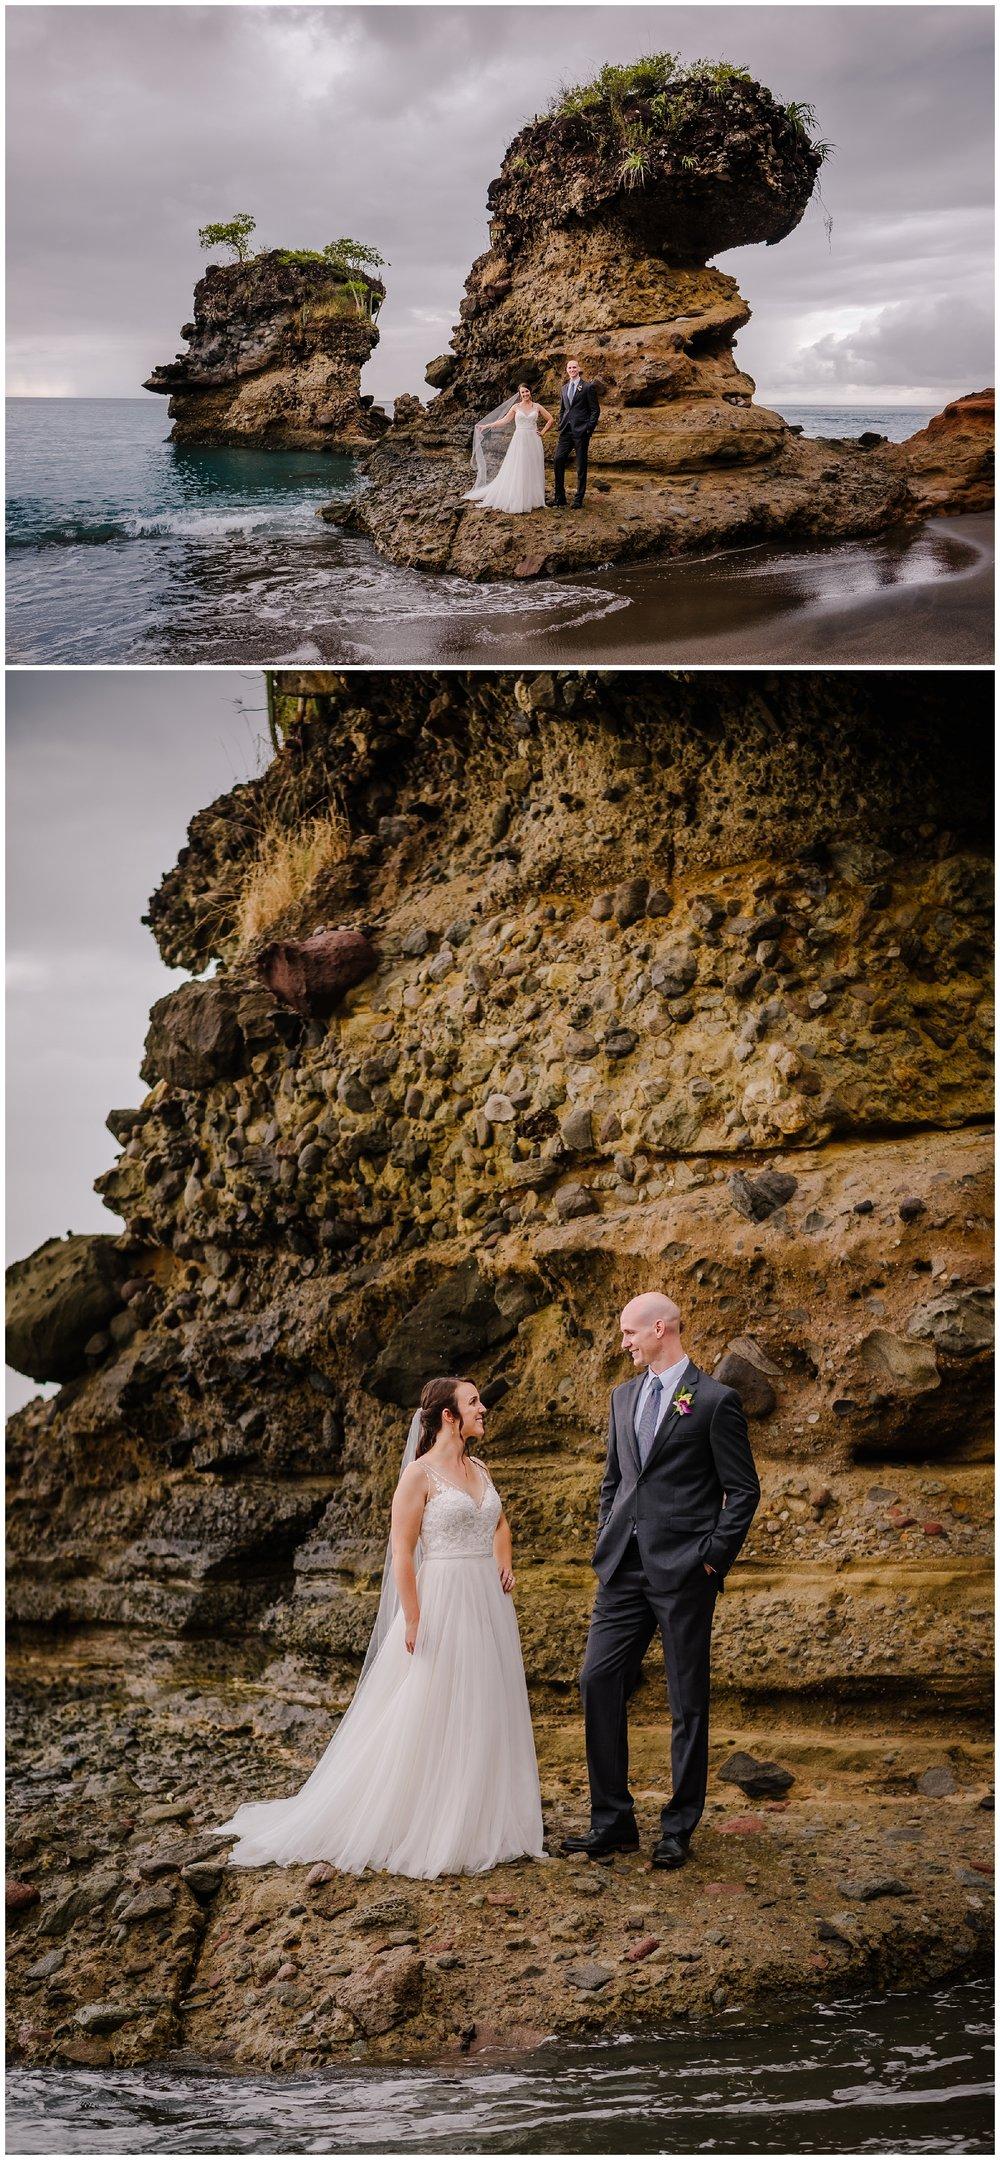 destination-wedding-photographer-st-lucia-black-sand-beaches_0075.jpg